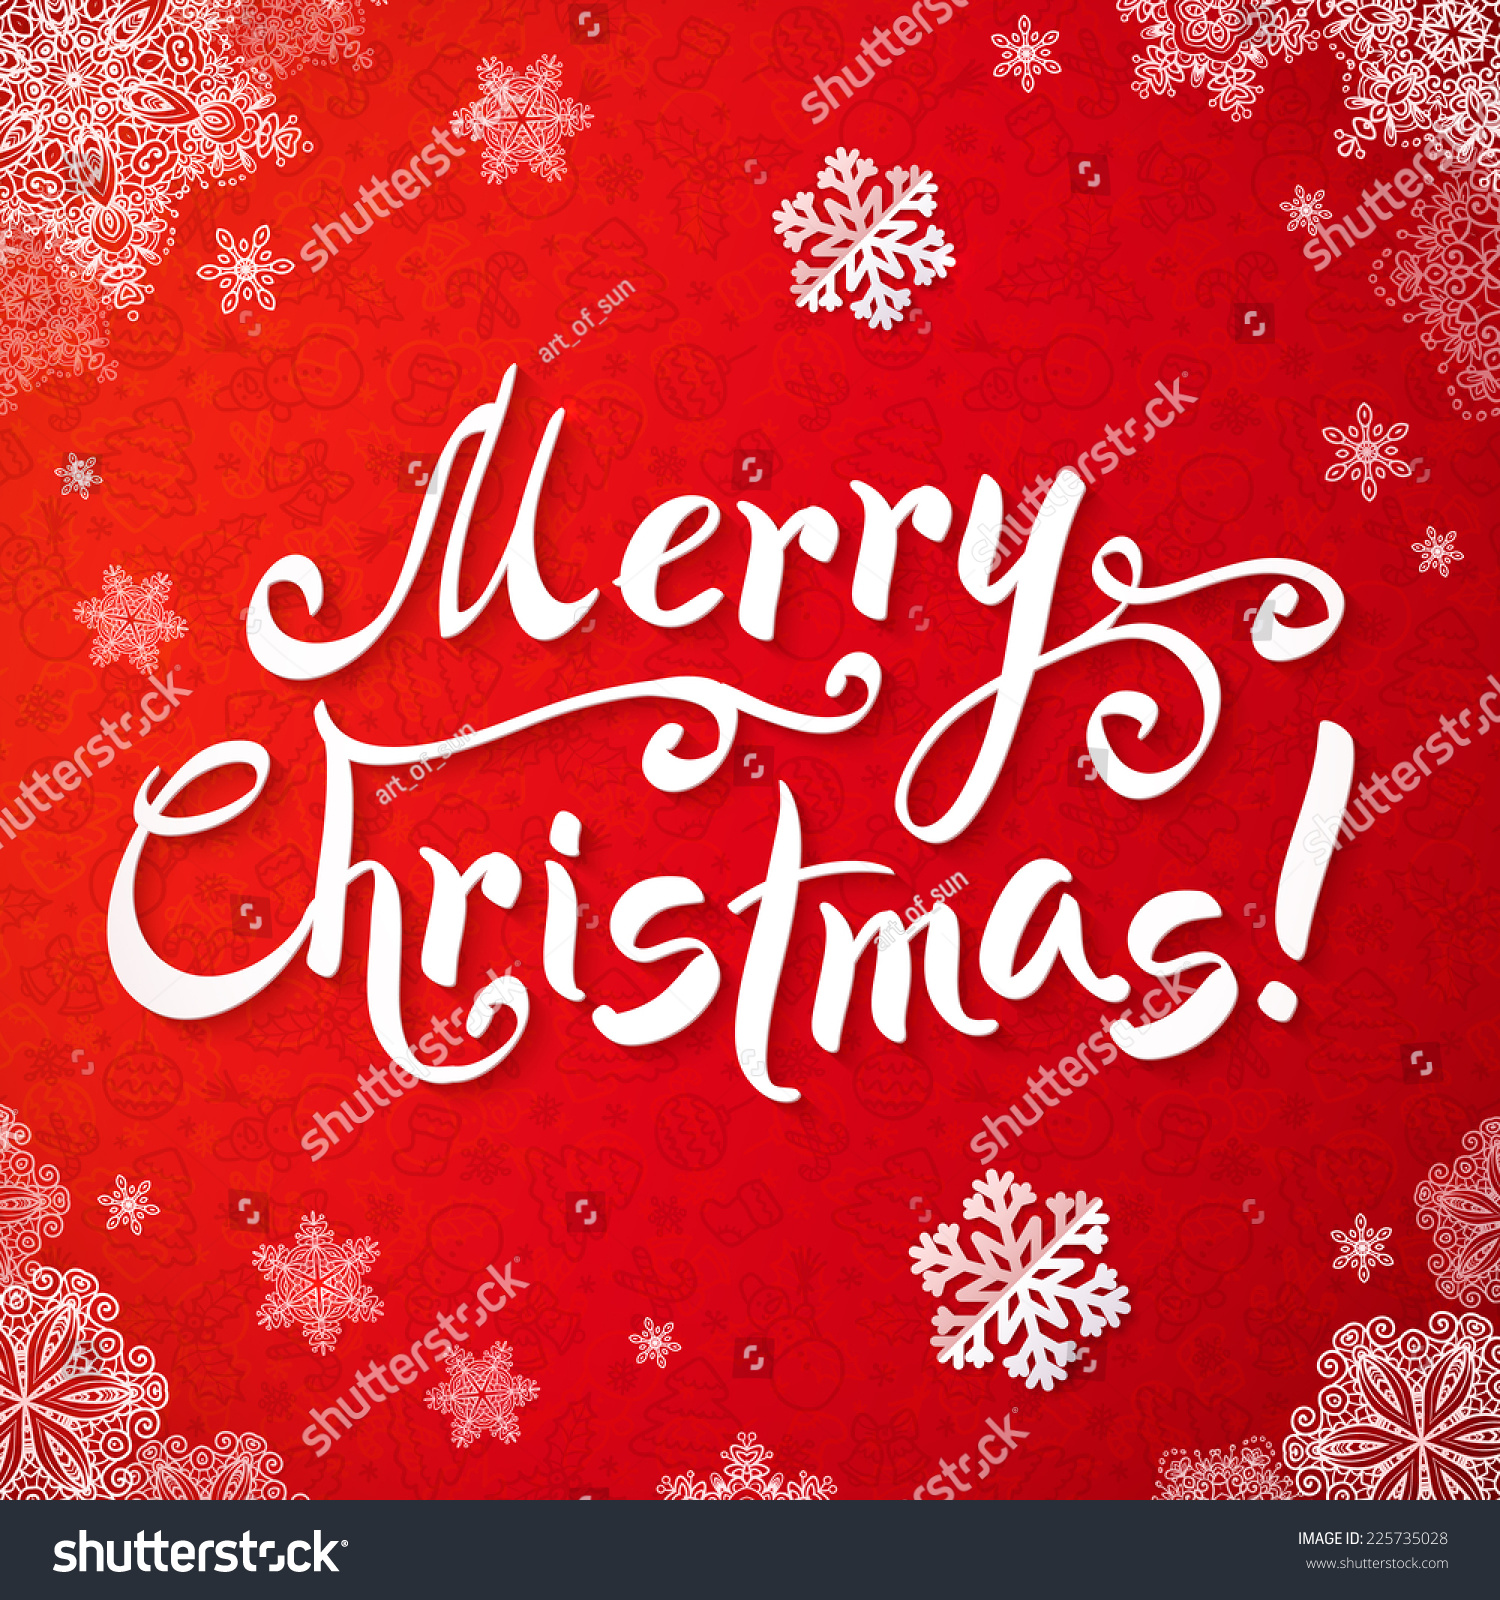 Creative writing merry christmas 4matulb creative writing merry christmas m4hsunfo